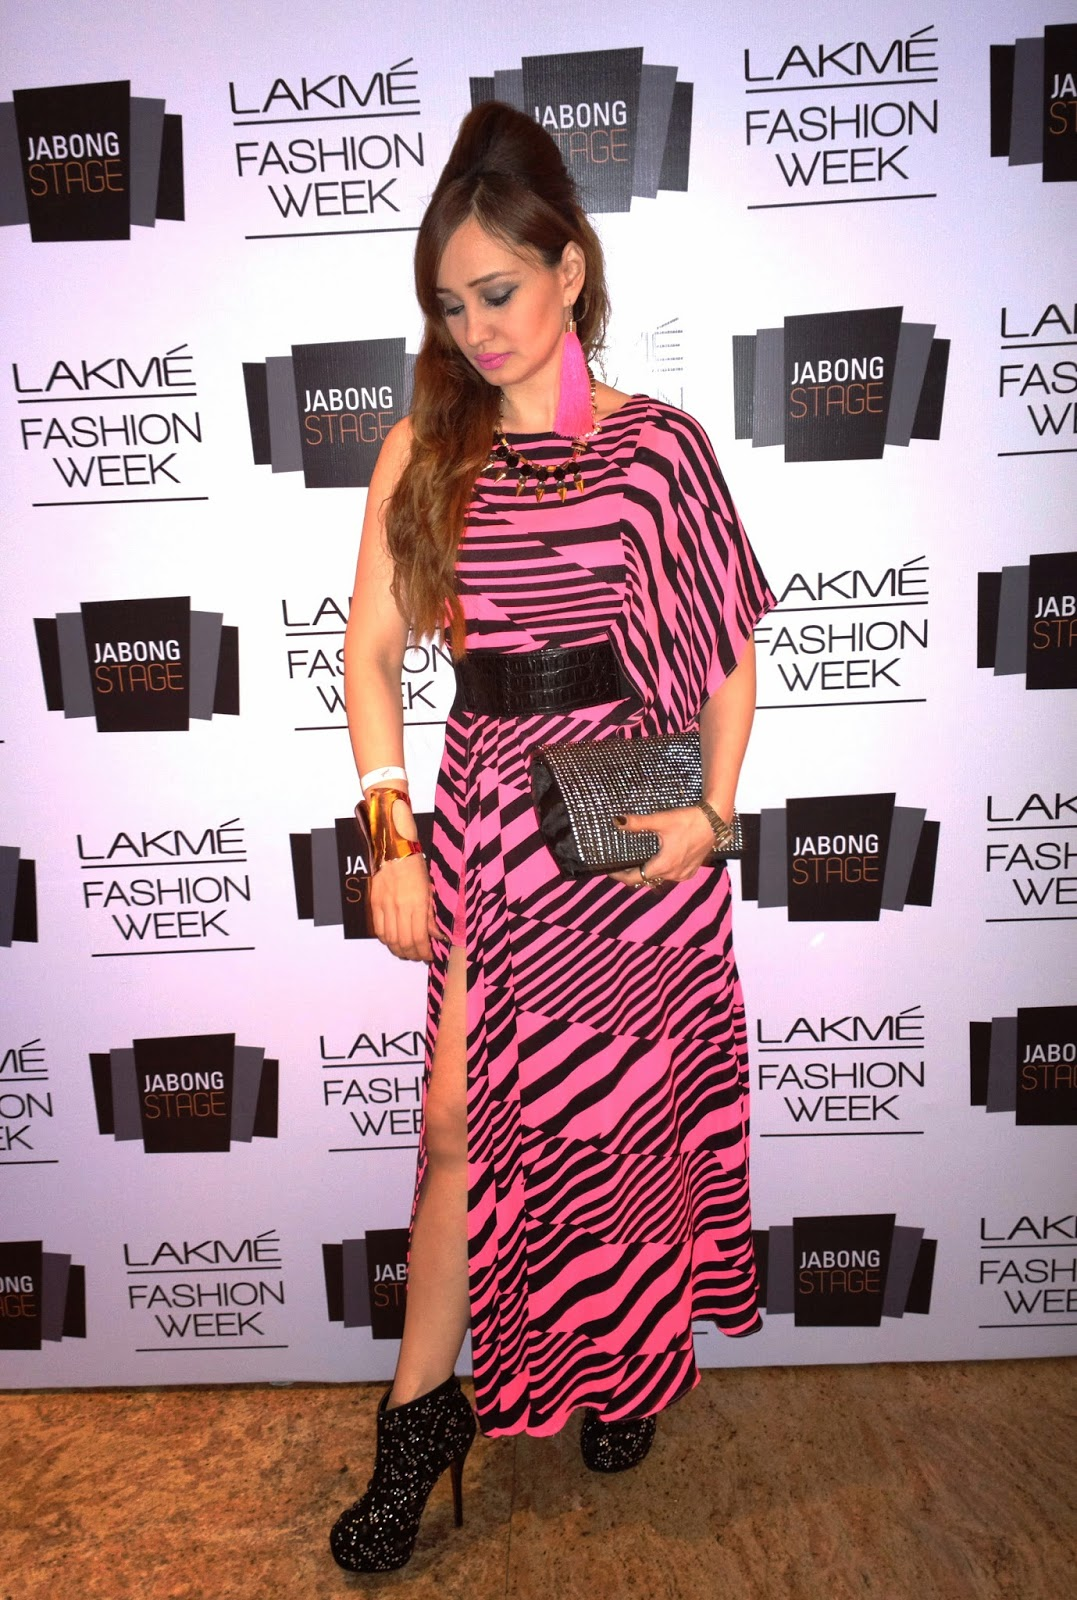 Black & Pink Maxi Dress at Lakme Fashion Week